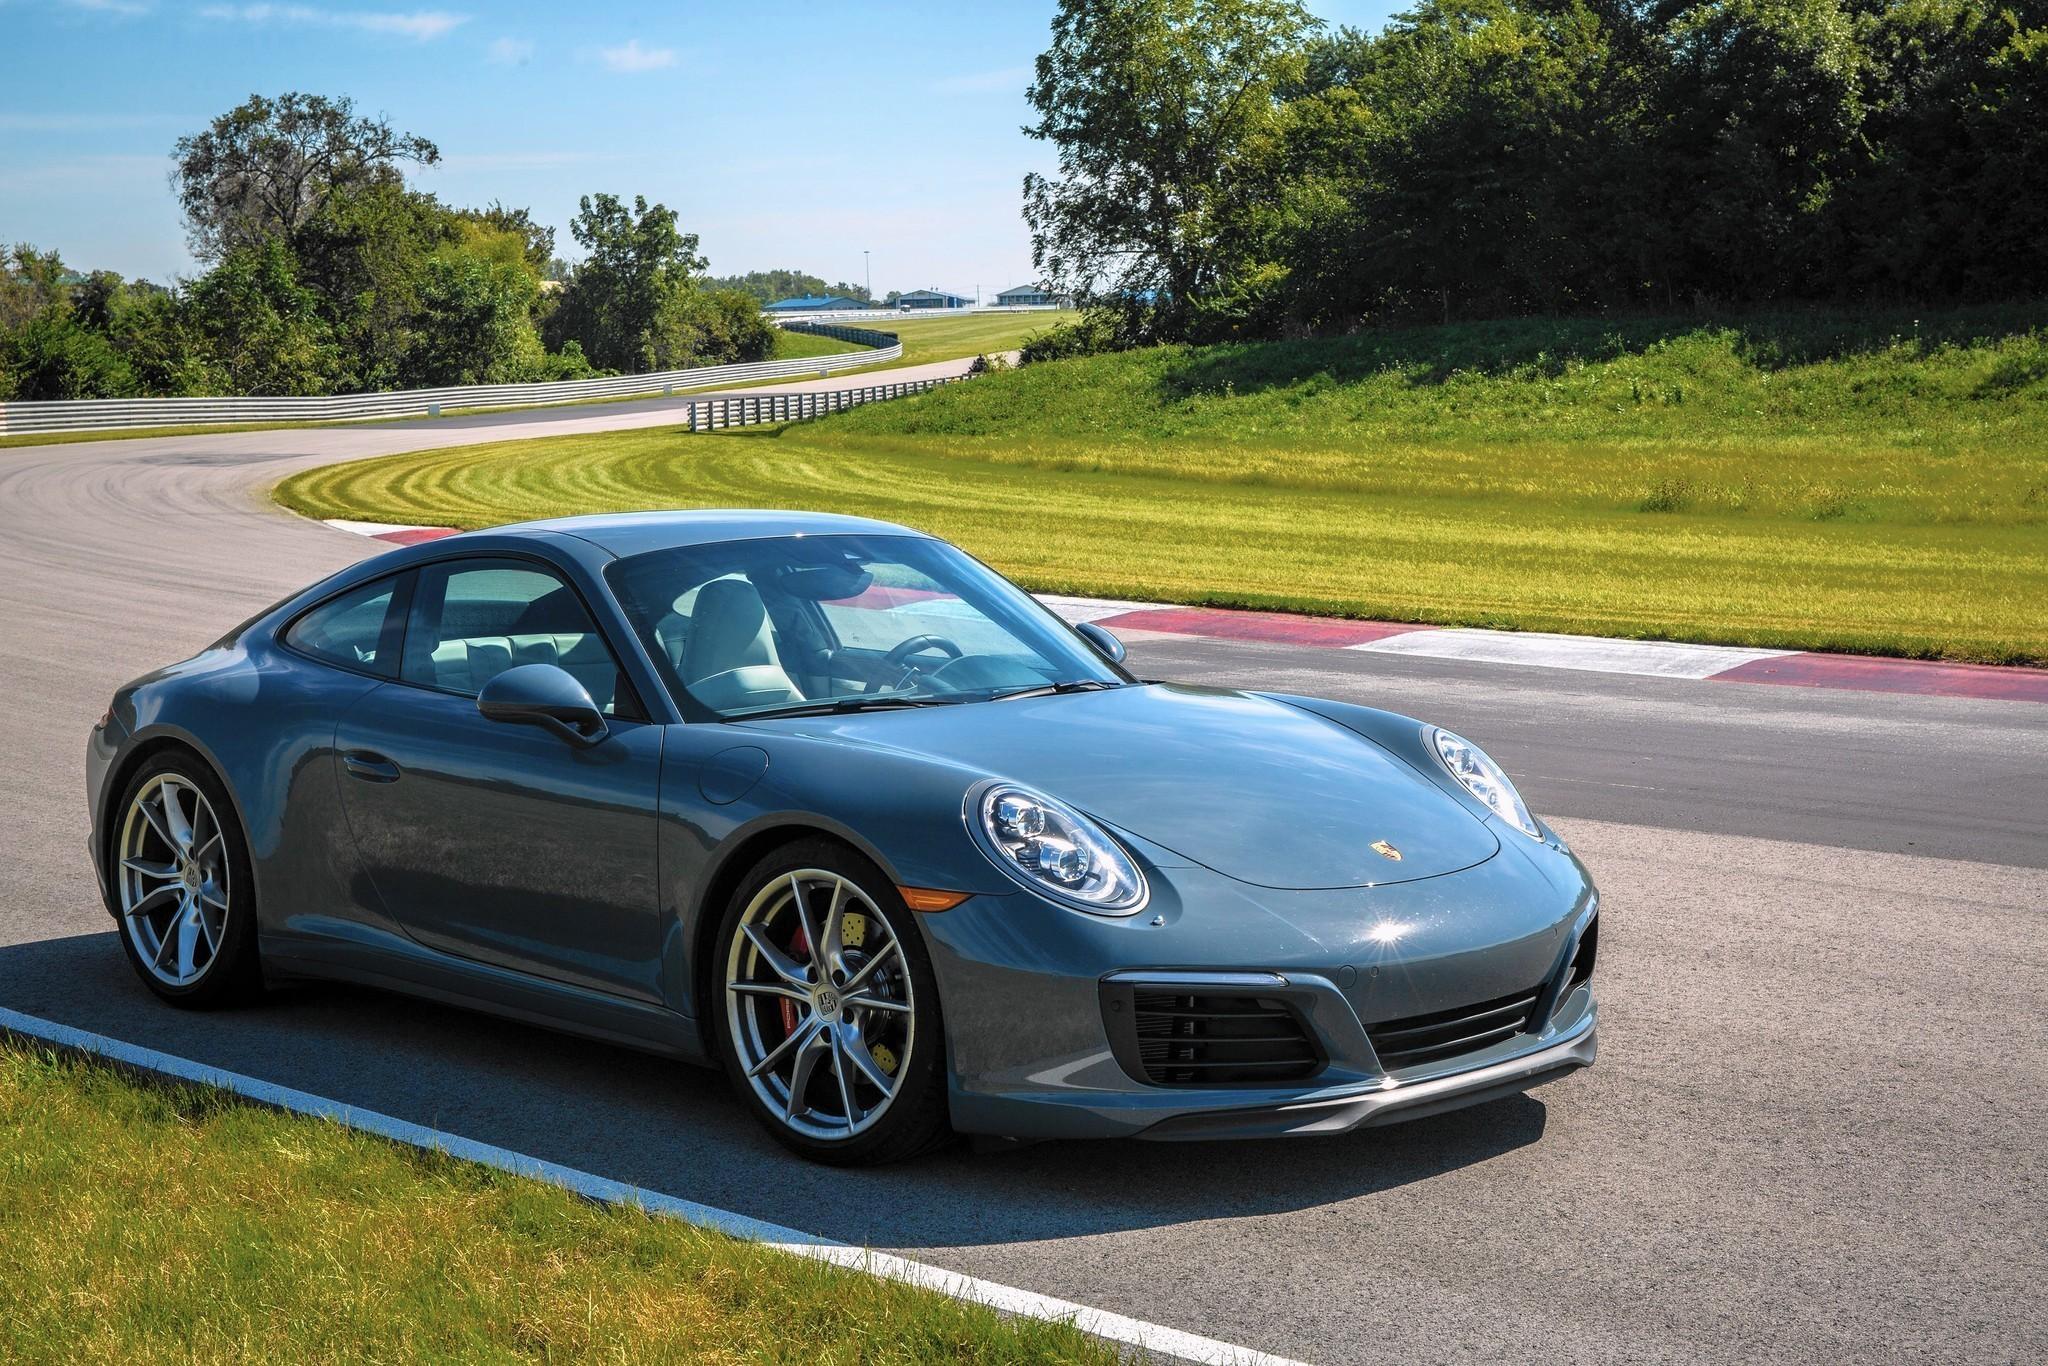 2017 porsche 911 carrera 4s in graphite blue metallic. Black Bedroom Furniture Sets. Home Design Ideas